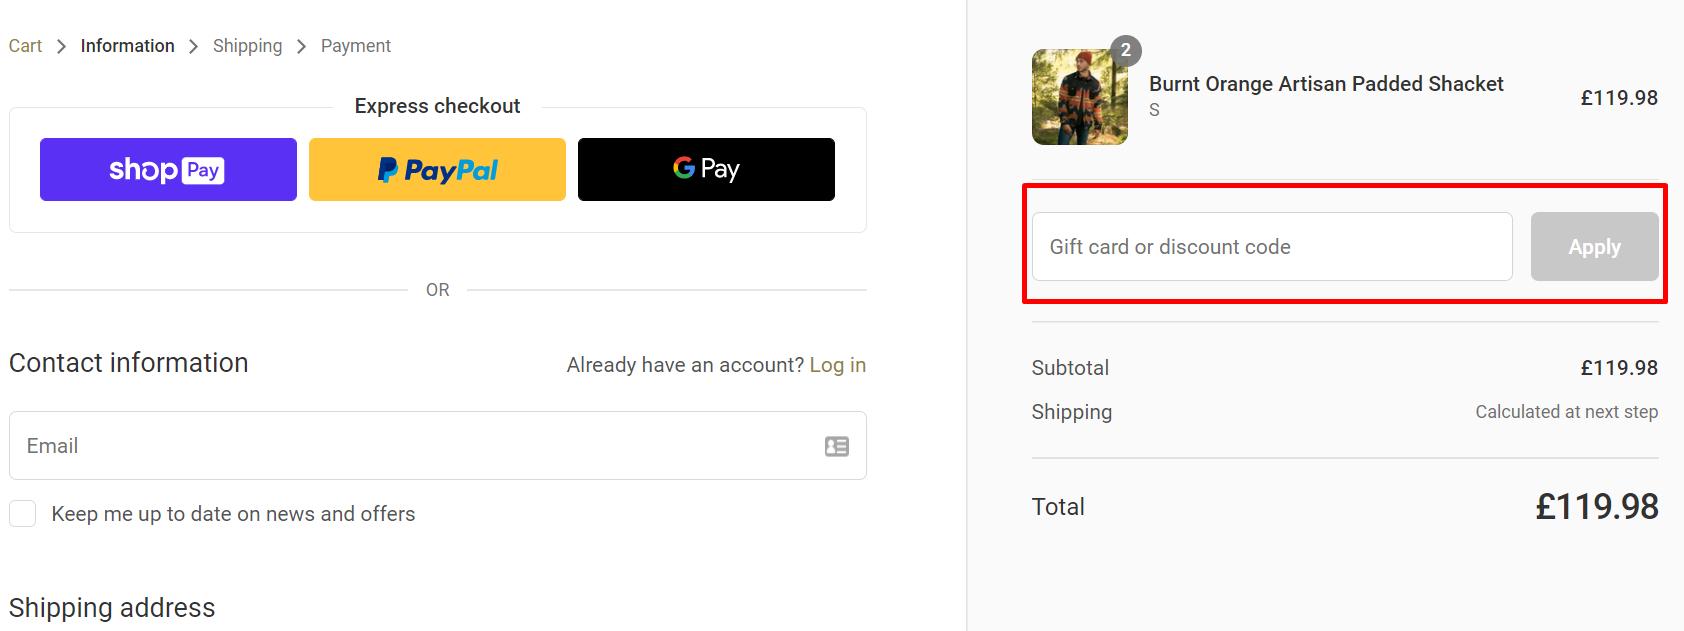 How do I use my Gandys discount code?